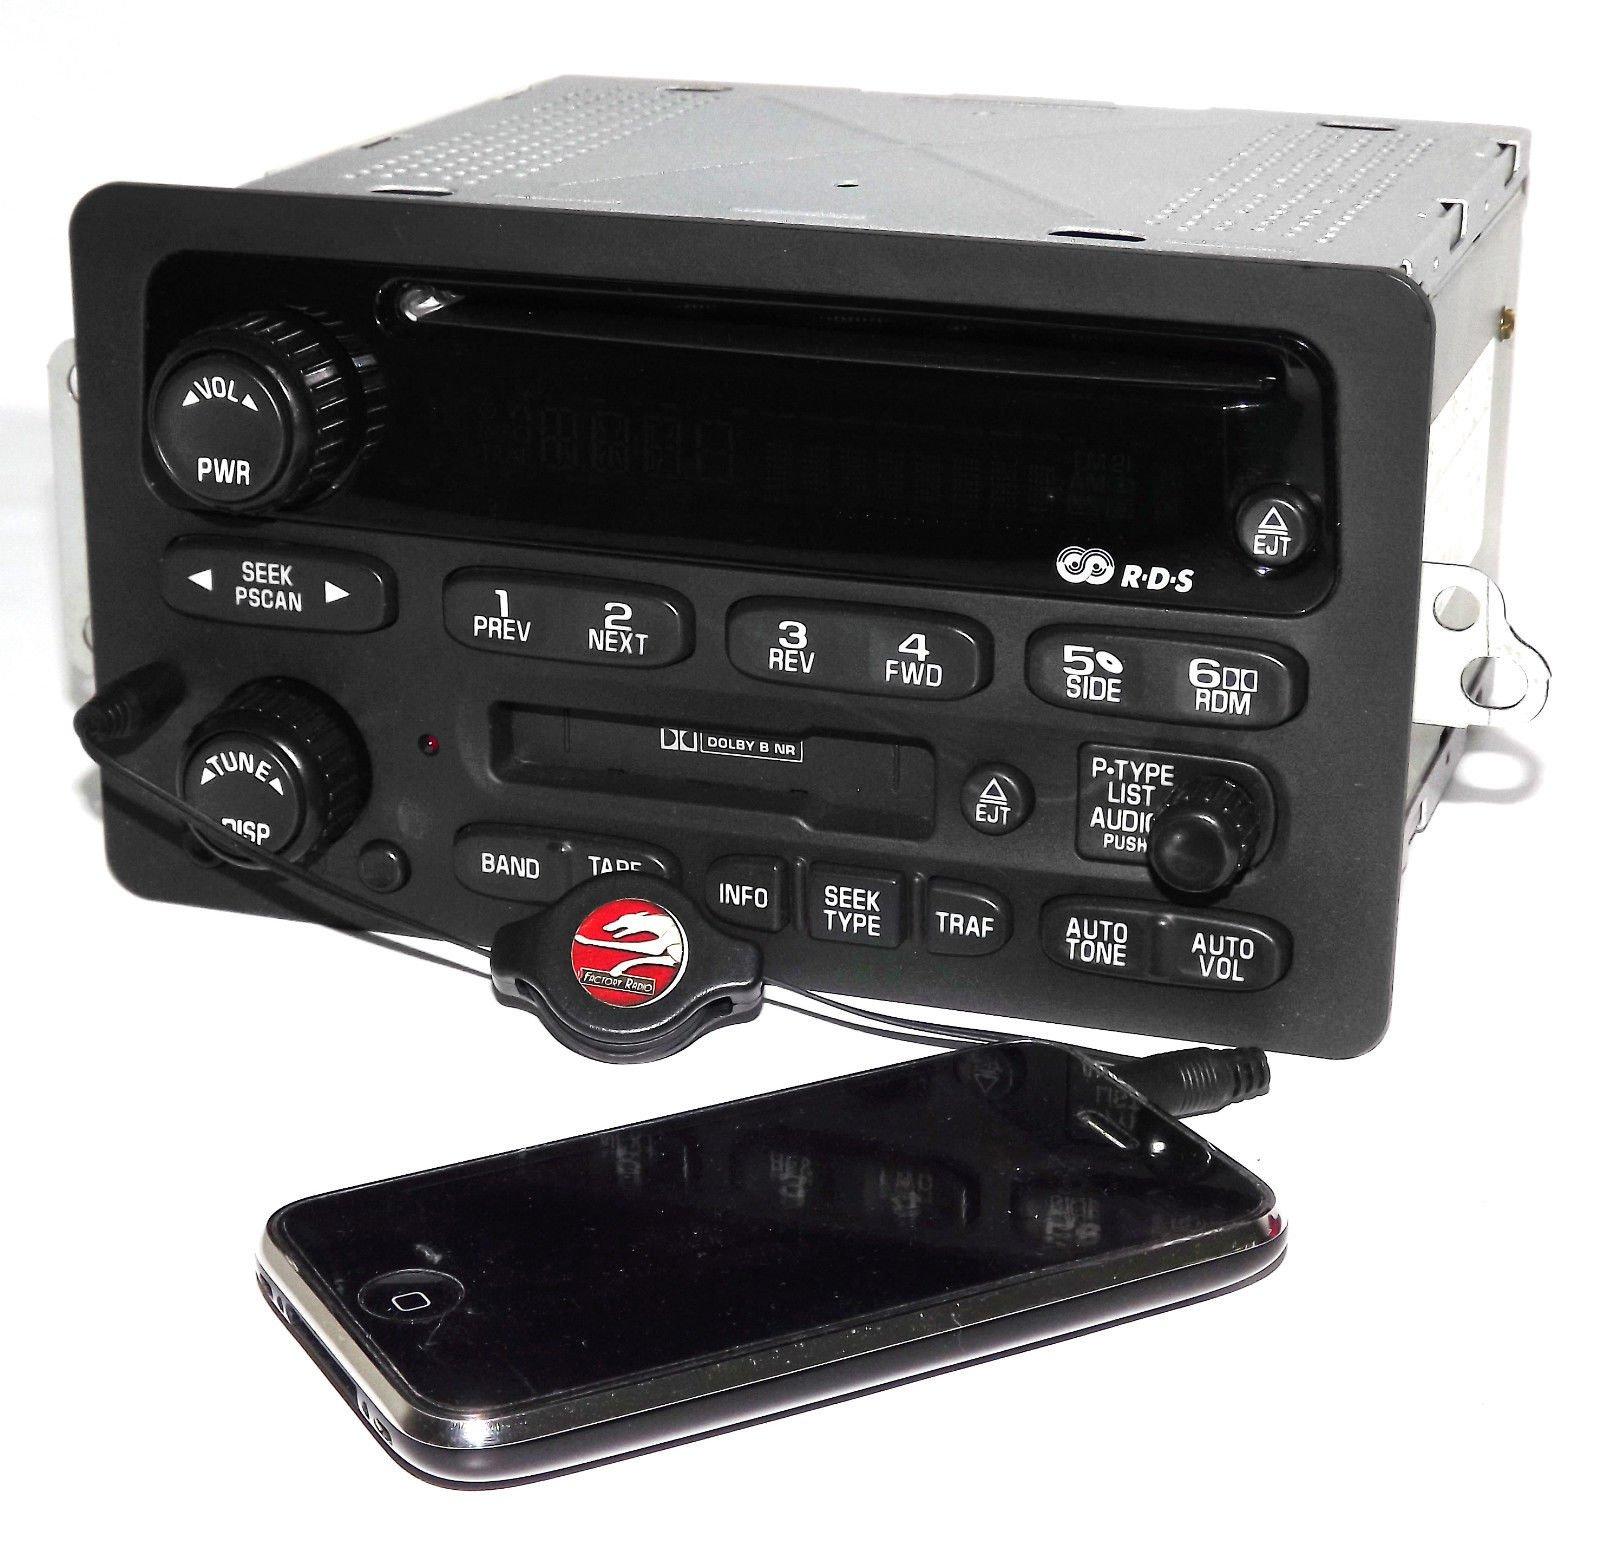 Chevy 2000-05 Car Radio - AM FM CD Cassette Player w Aux iPod mp3 Input 10318438